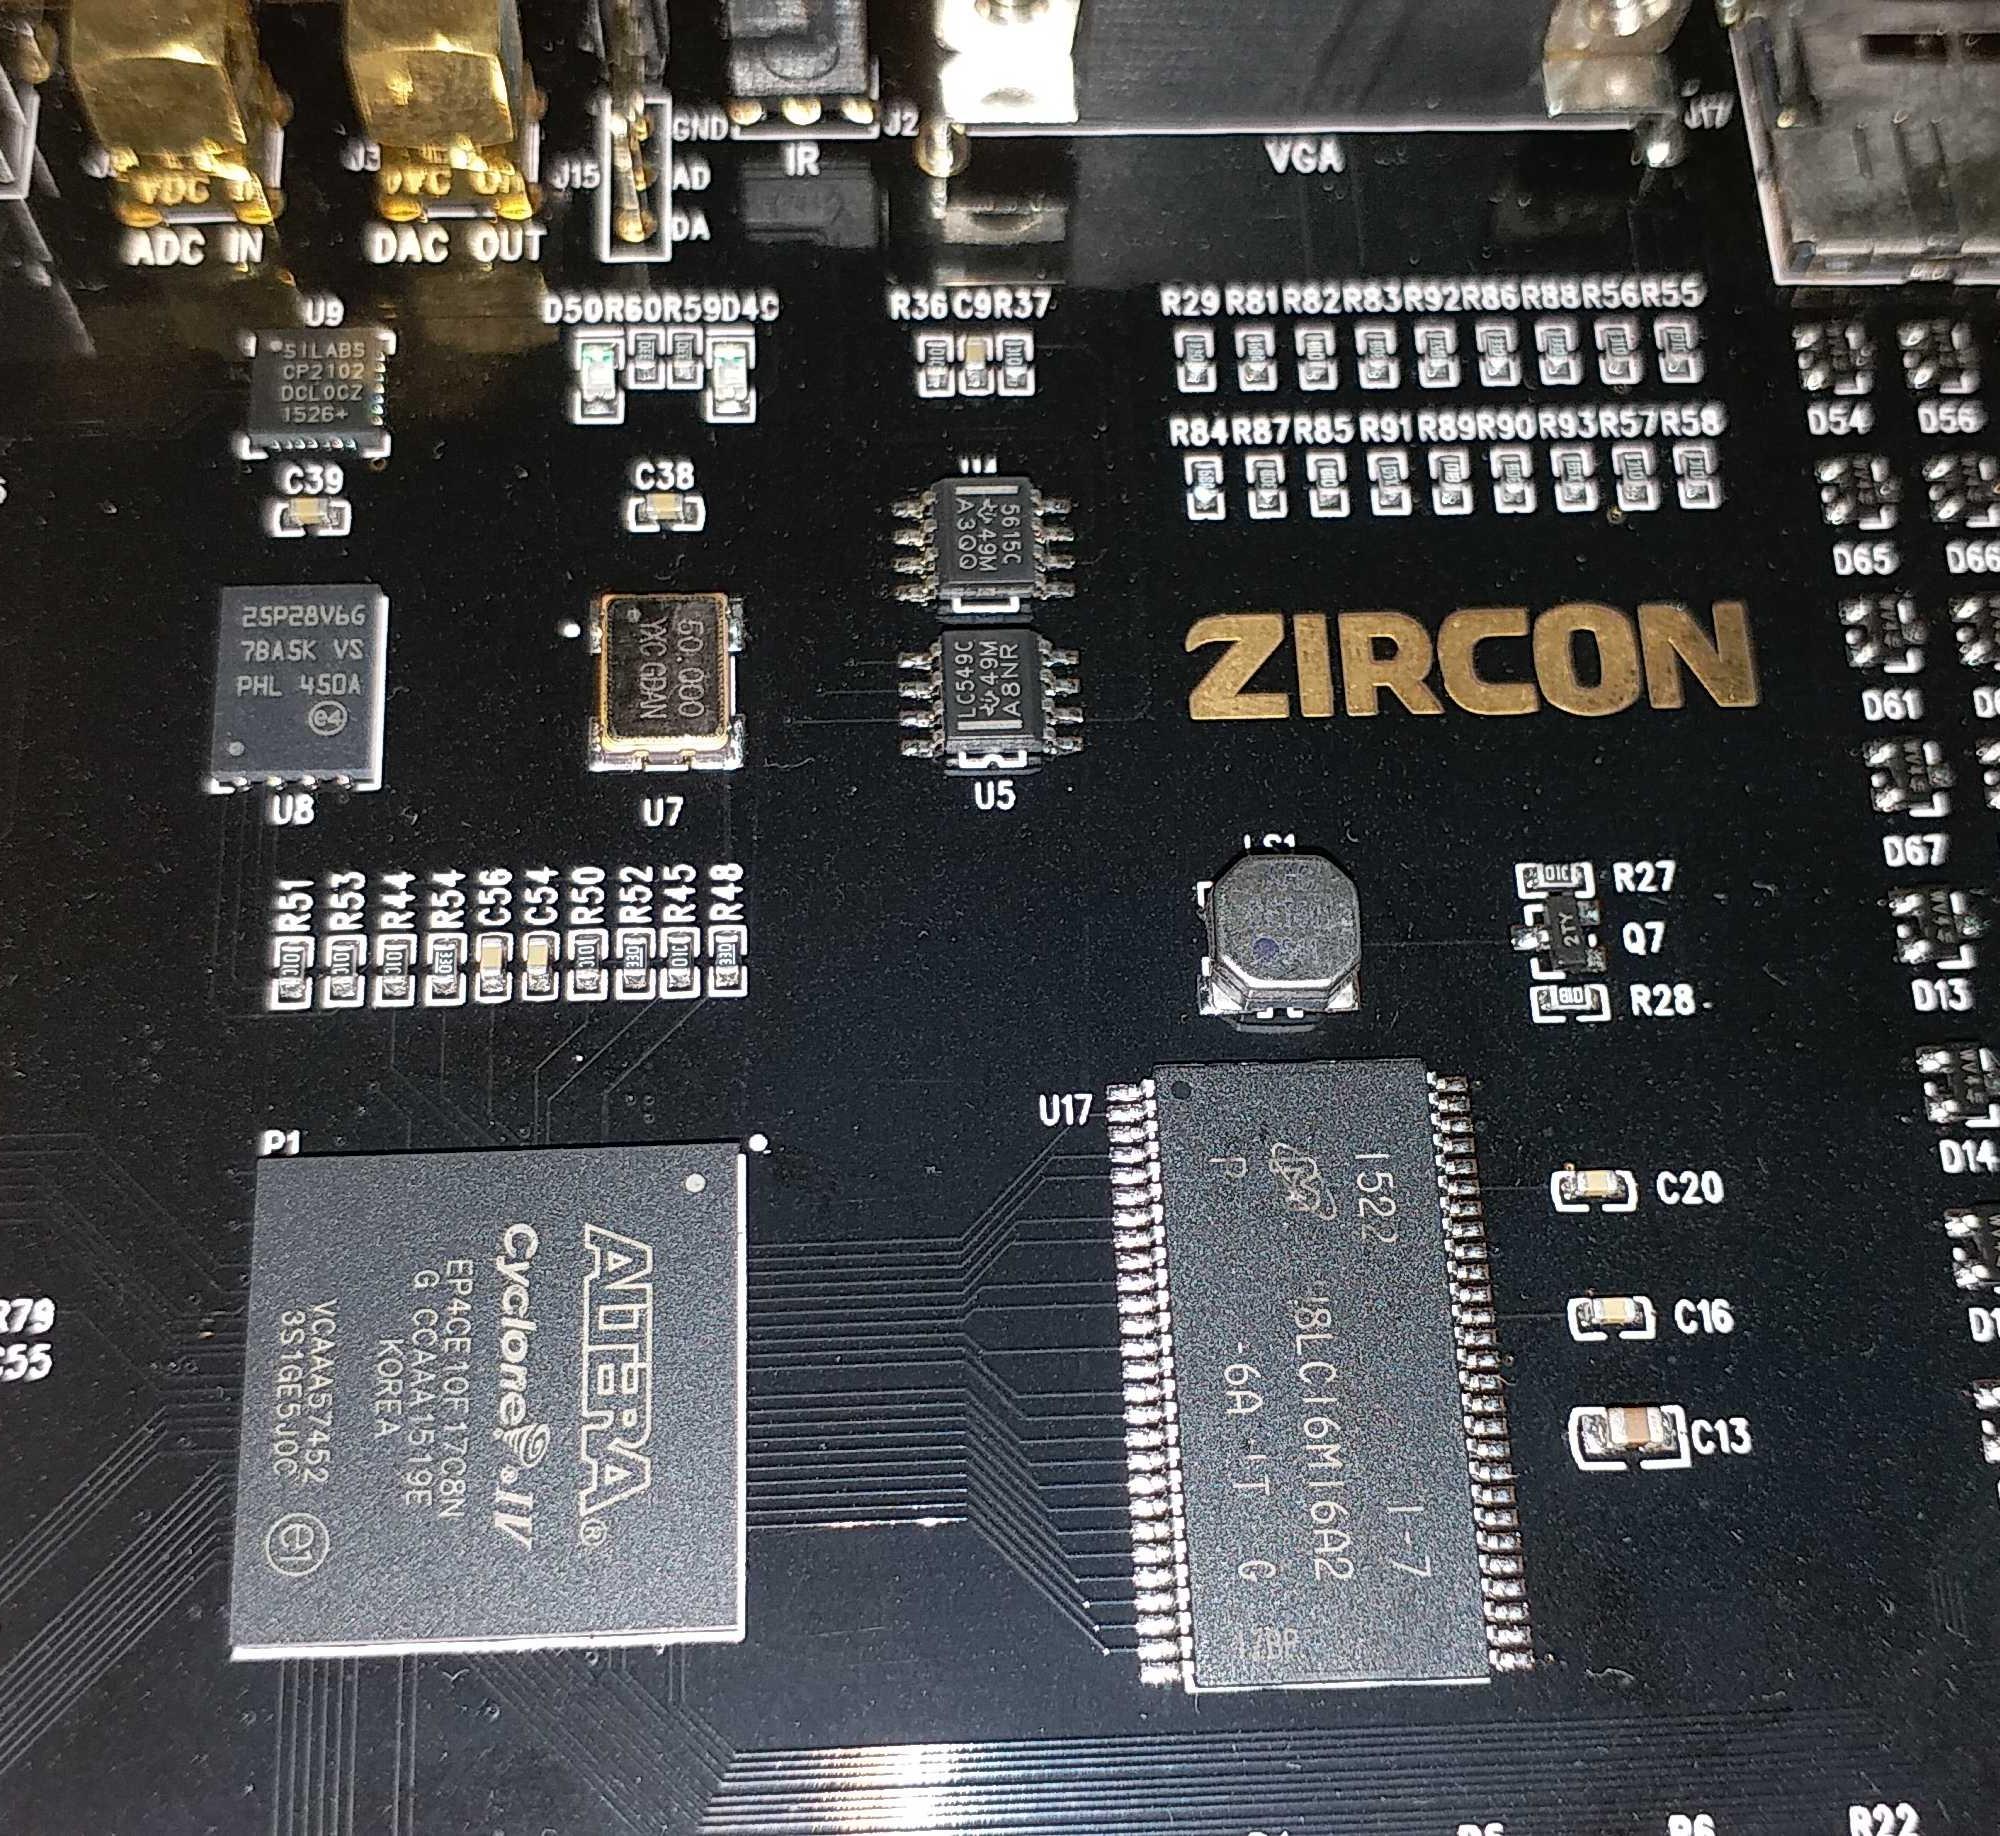 FPGA(Field-Programmable Gate Array),即现场可编程门阵列,它是在PAL、GAL、CPLD等可编程器件的基础上进一步发展的产物。它是作为专用集成电路(ASIC)领域中的一种半定制电路而出现的,既解决了定制电路的不足,又克服了原有可编程器件门电路数有限的缺点。而提及学习Altera FPGA的利器,最具代表性的产品便是锆石科技-A4 FPGA开发板了,可谓是家喻户晓,随便找个人问问都能看见锆石的身影,不仅资料齐全,而且硬件方面设计得极为优秀,扩展接口与外围设备丰富,非常适合探